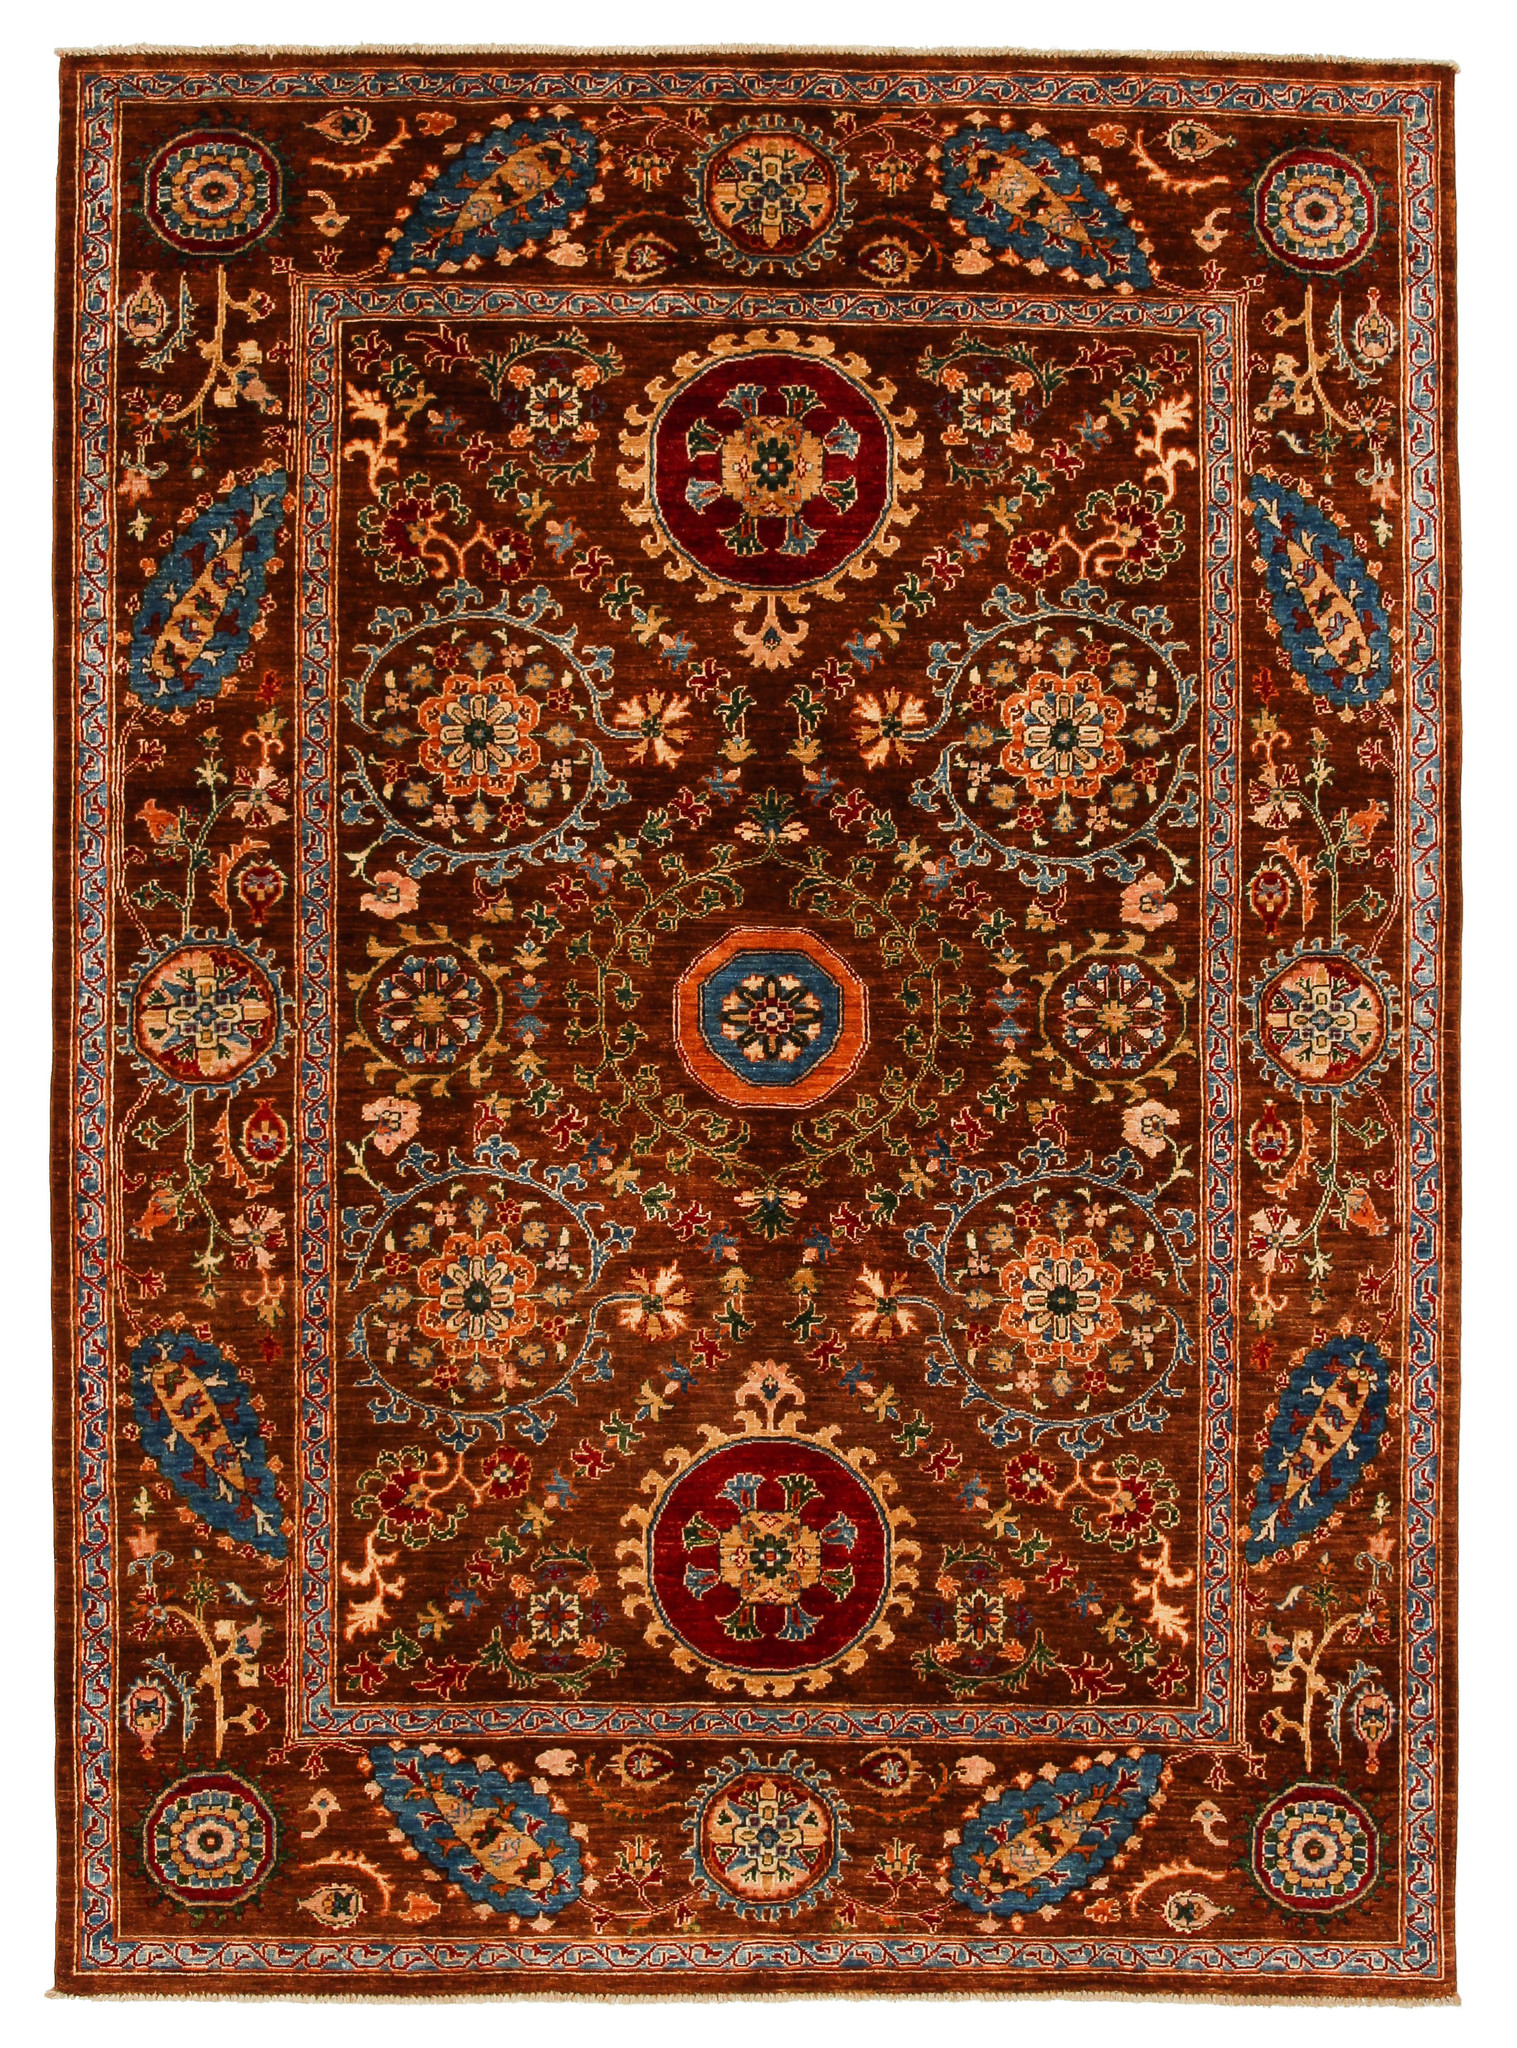 Hand Knotted 9 1 X 6 7 Suzani Wool Rug 278x203 Cm Oriental Carpet Zargar Rugs